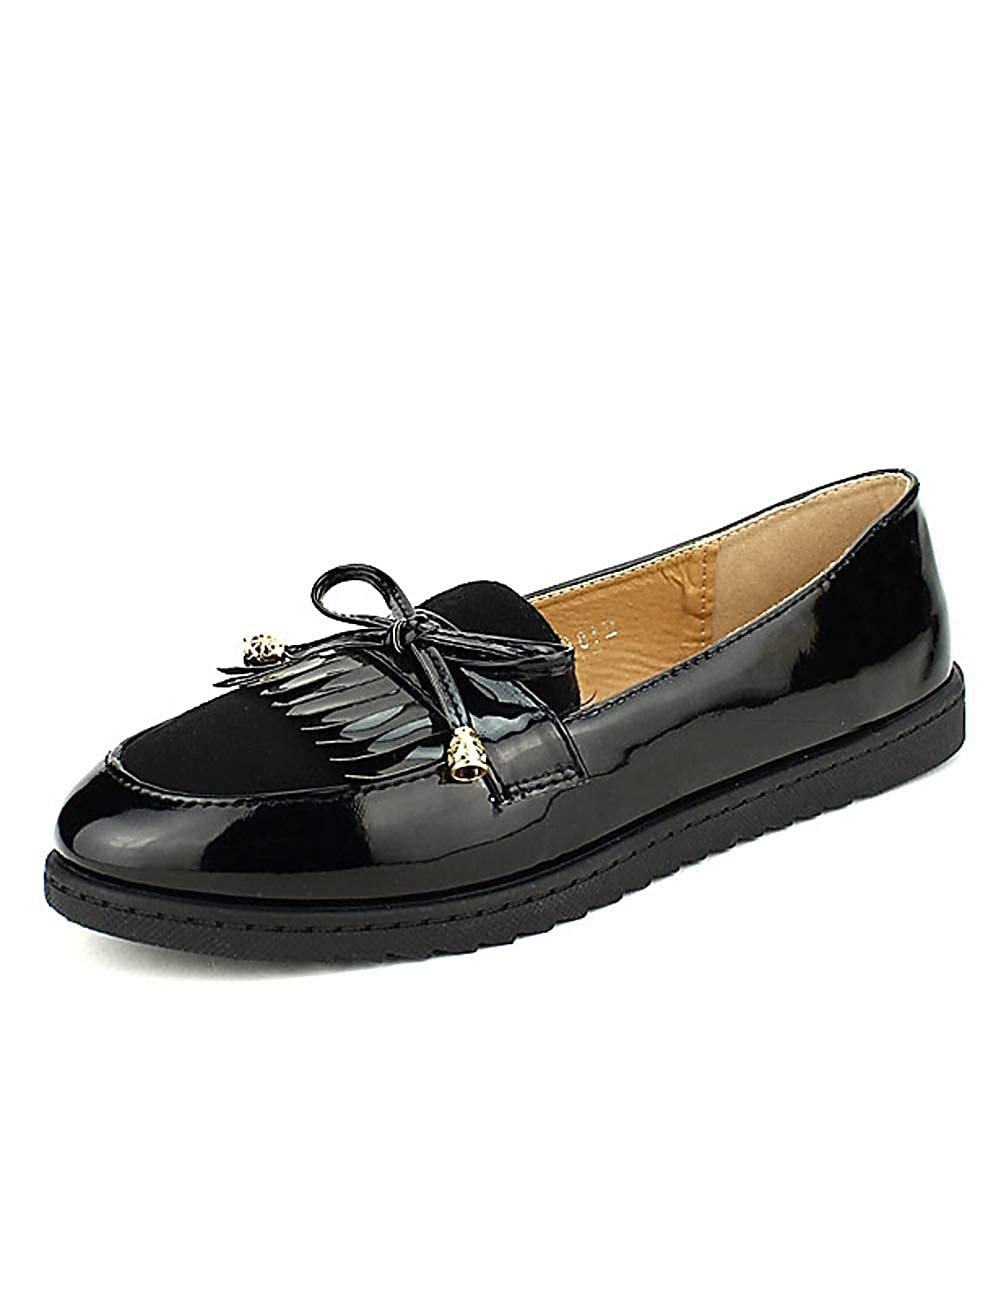 Cendriyon, Derbies Derbies Noires CINKS ME CINKS Chaussures Femme Femme Noir 21bf93a - reprogrammed.space